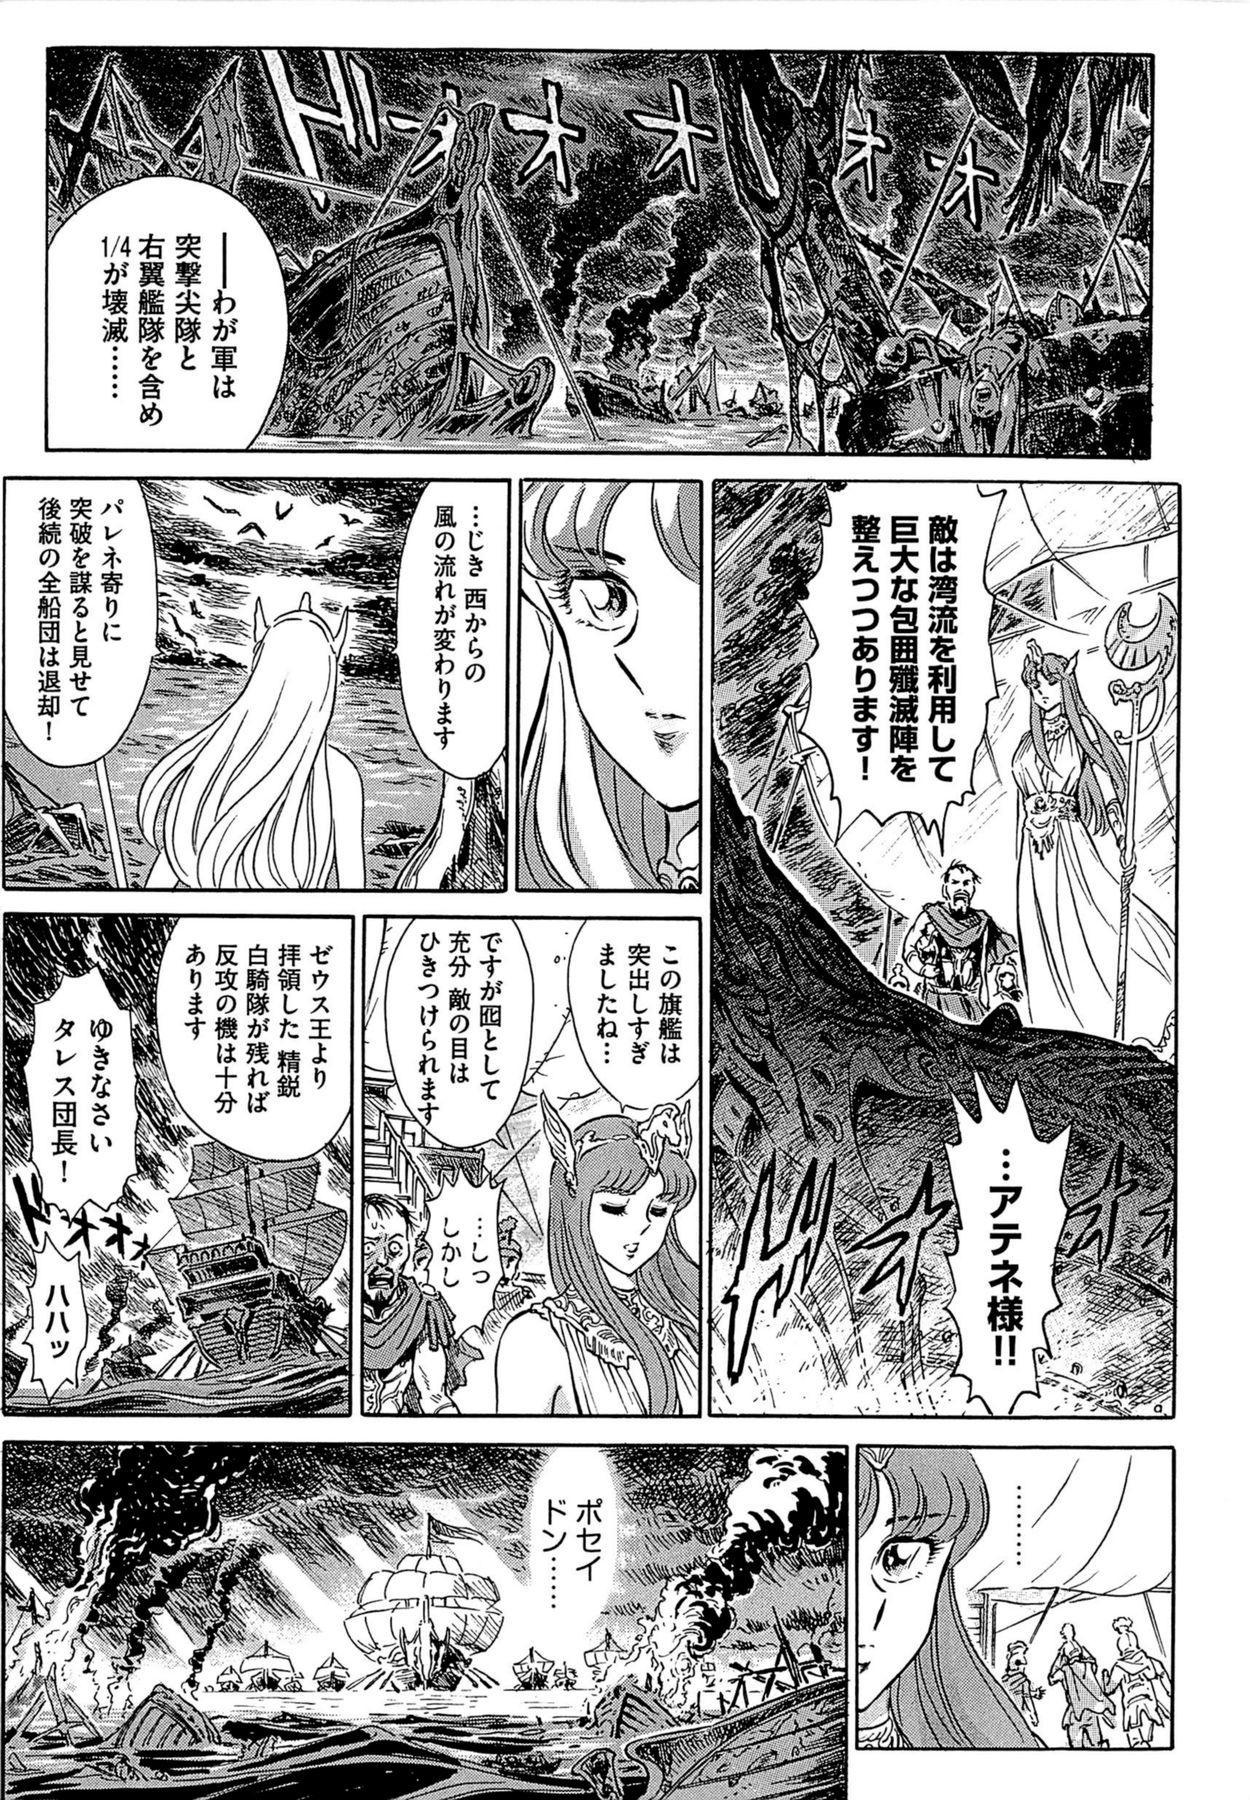 [Yosuteinu] The crysis of greece chapter 1-3 (FINAL)  - saint seiya 0